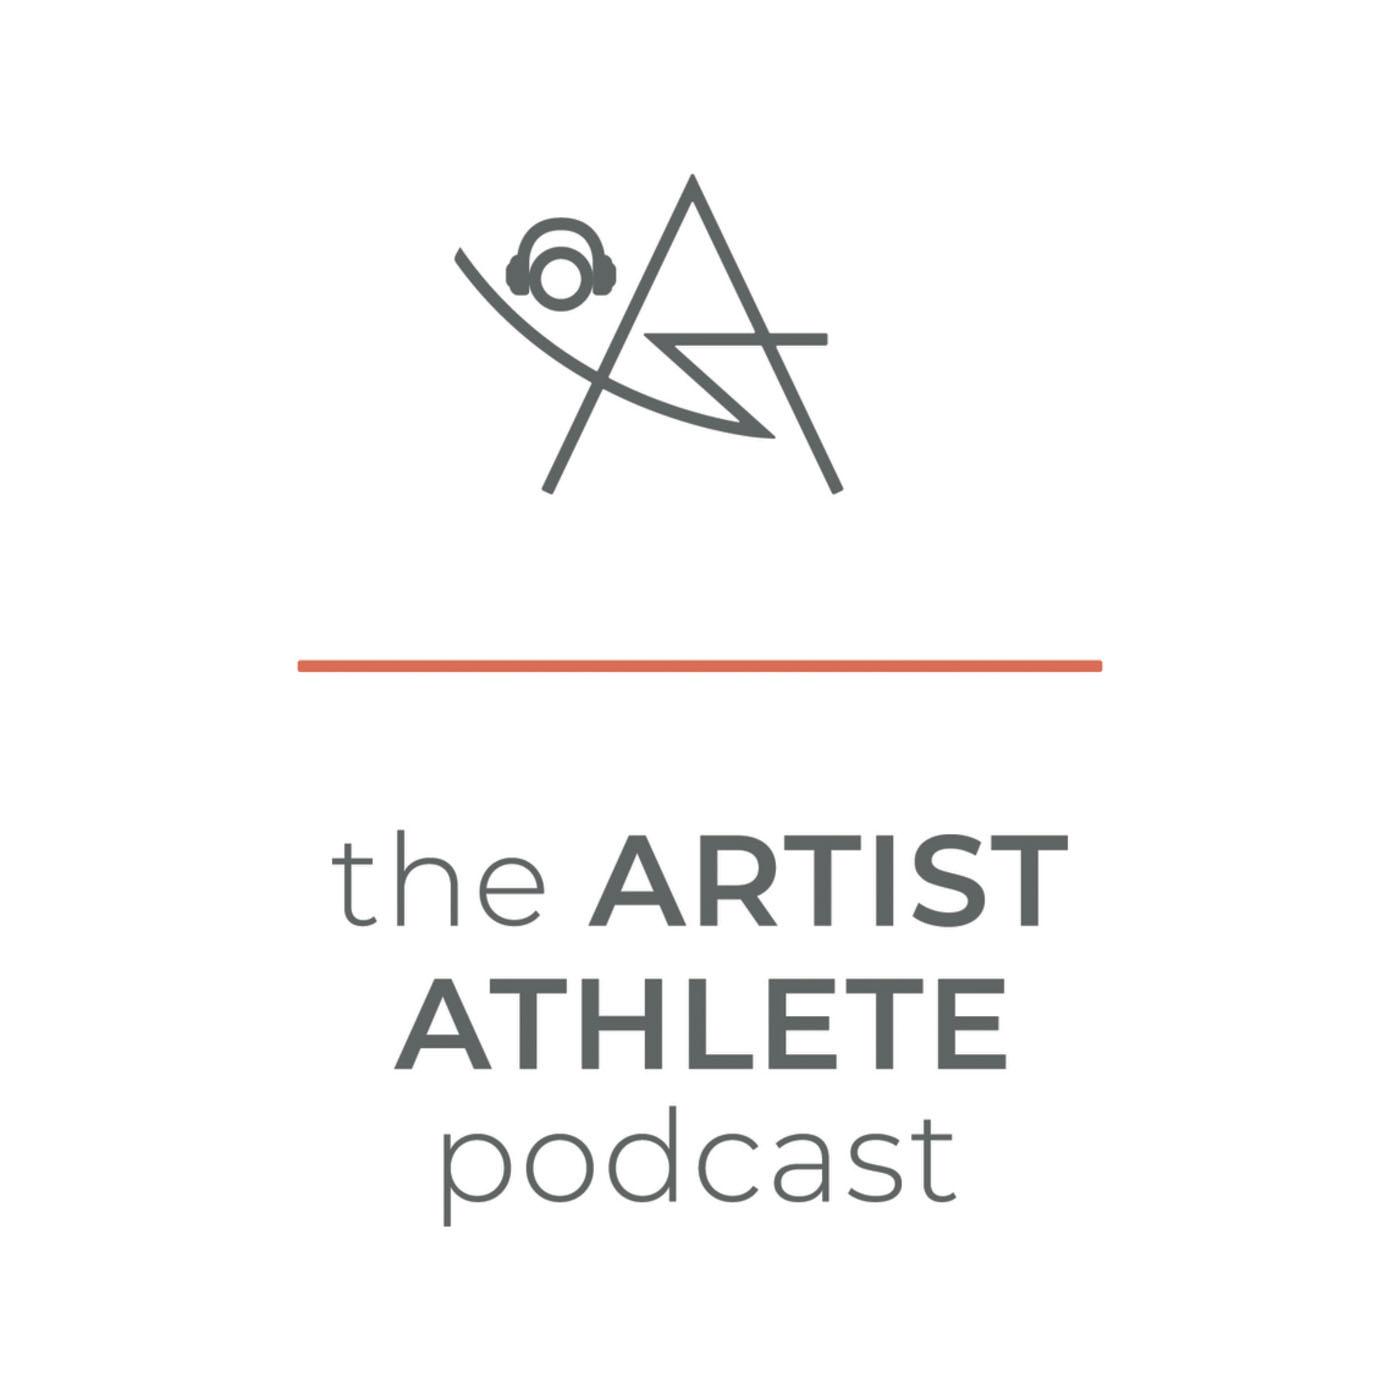 The Artist Athlete Podcast show art